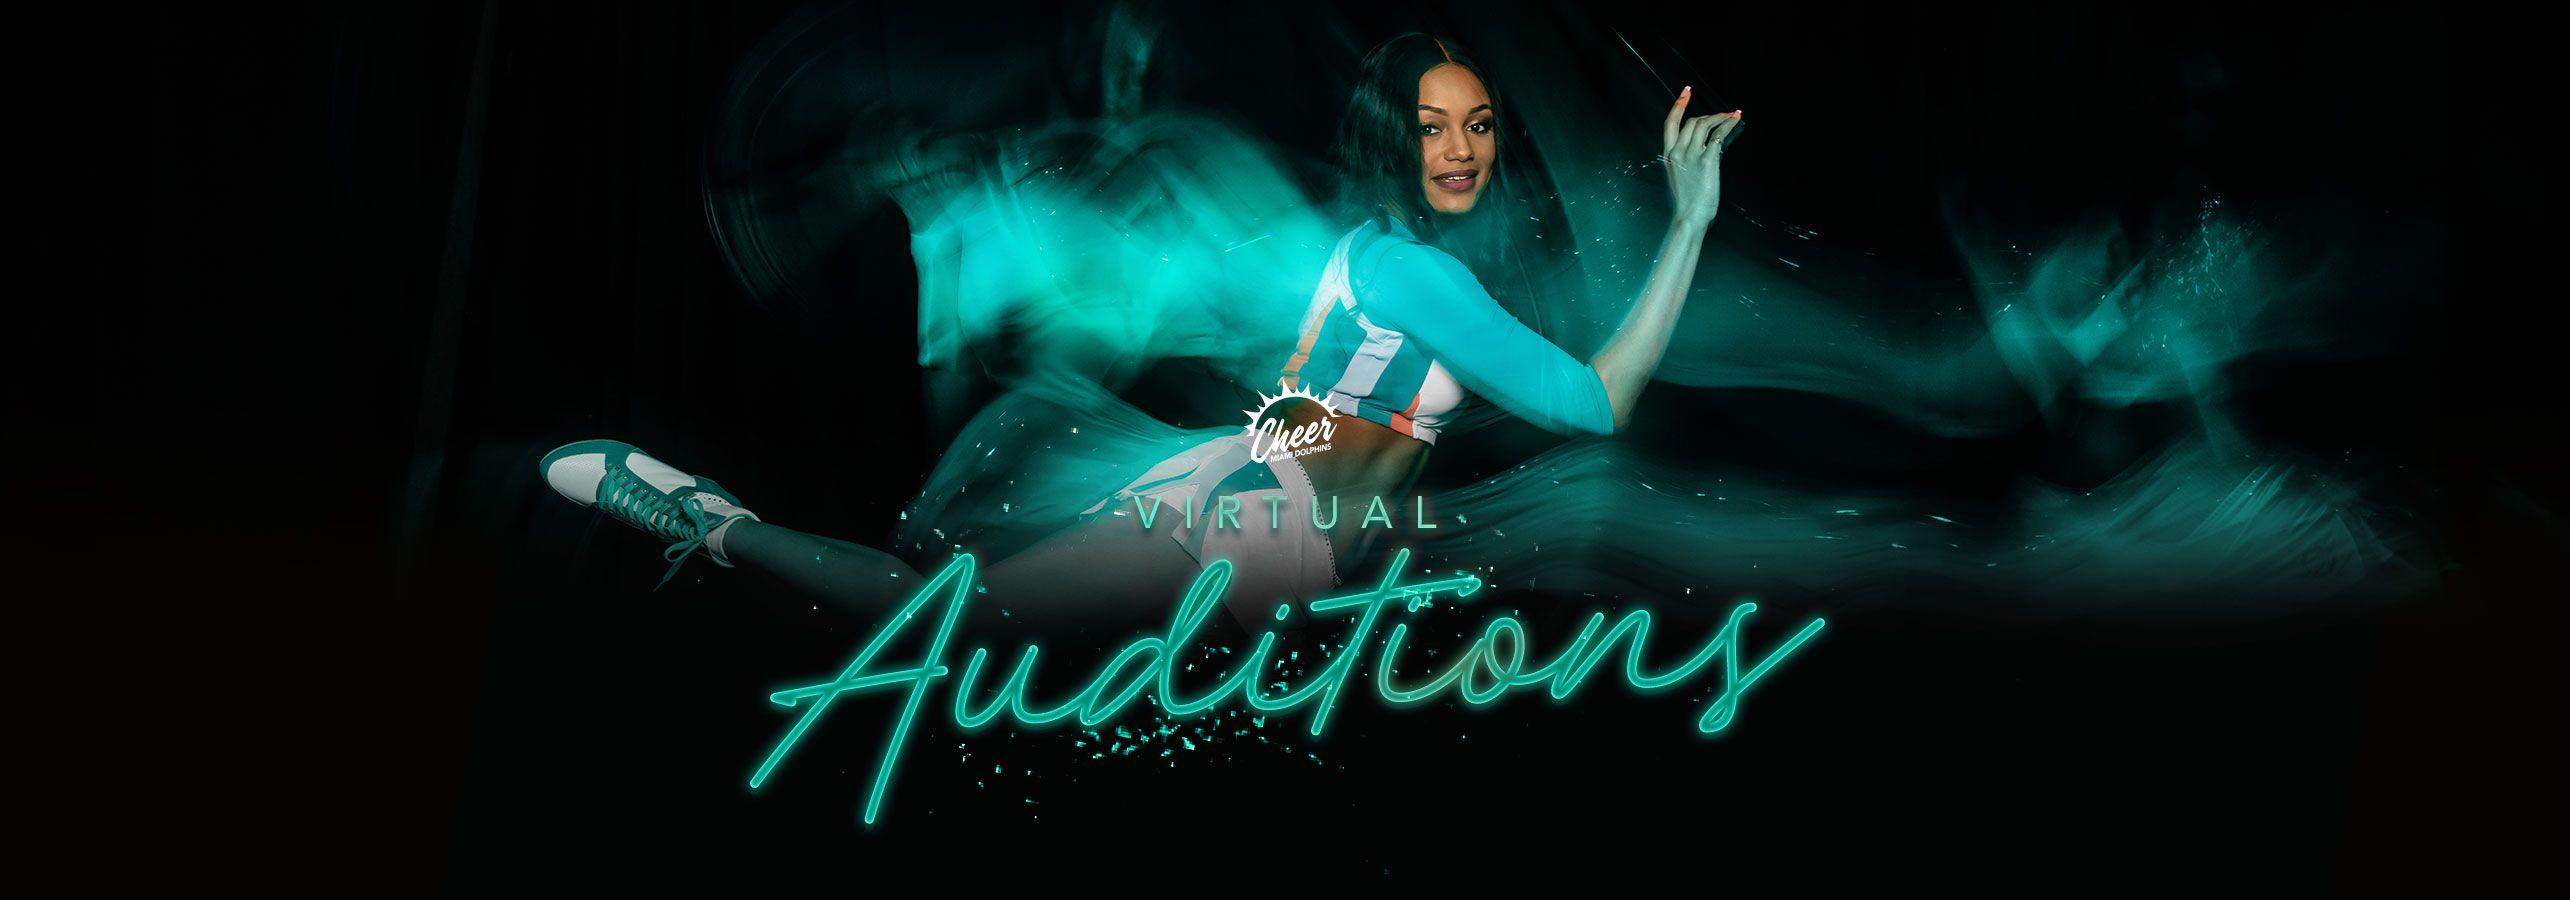 MDC241_Audition-Announcement_2570x900